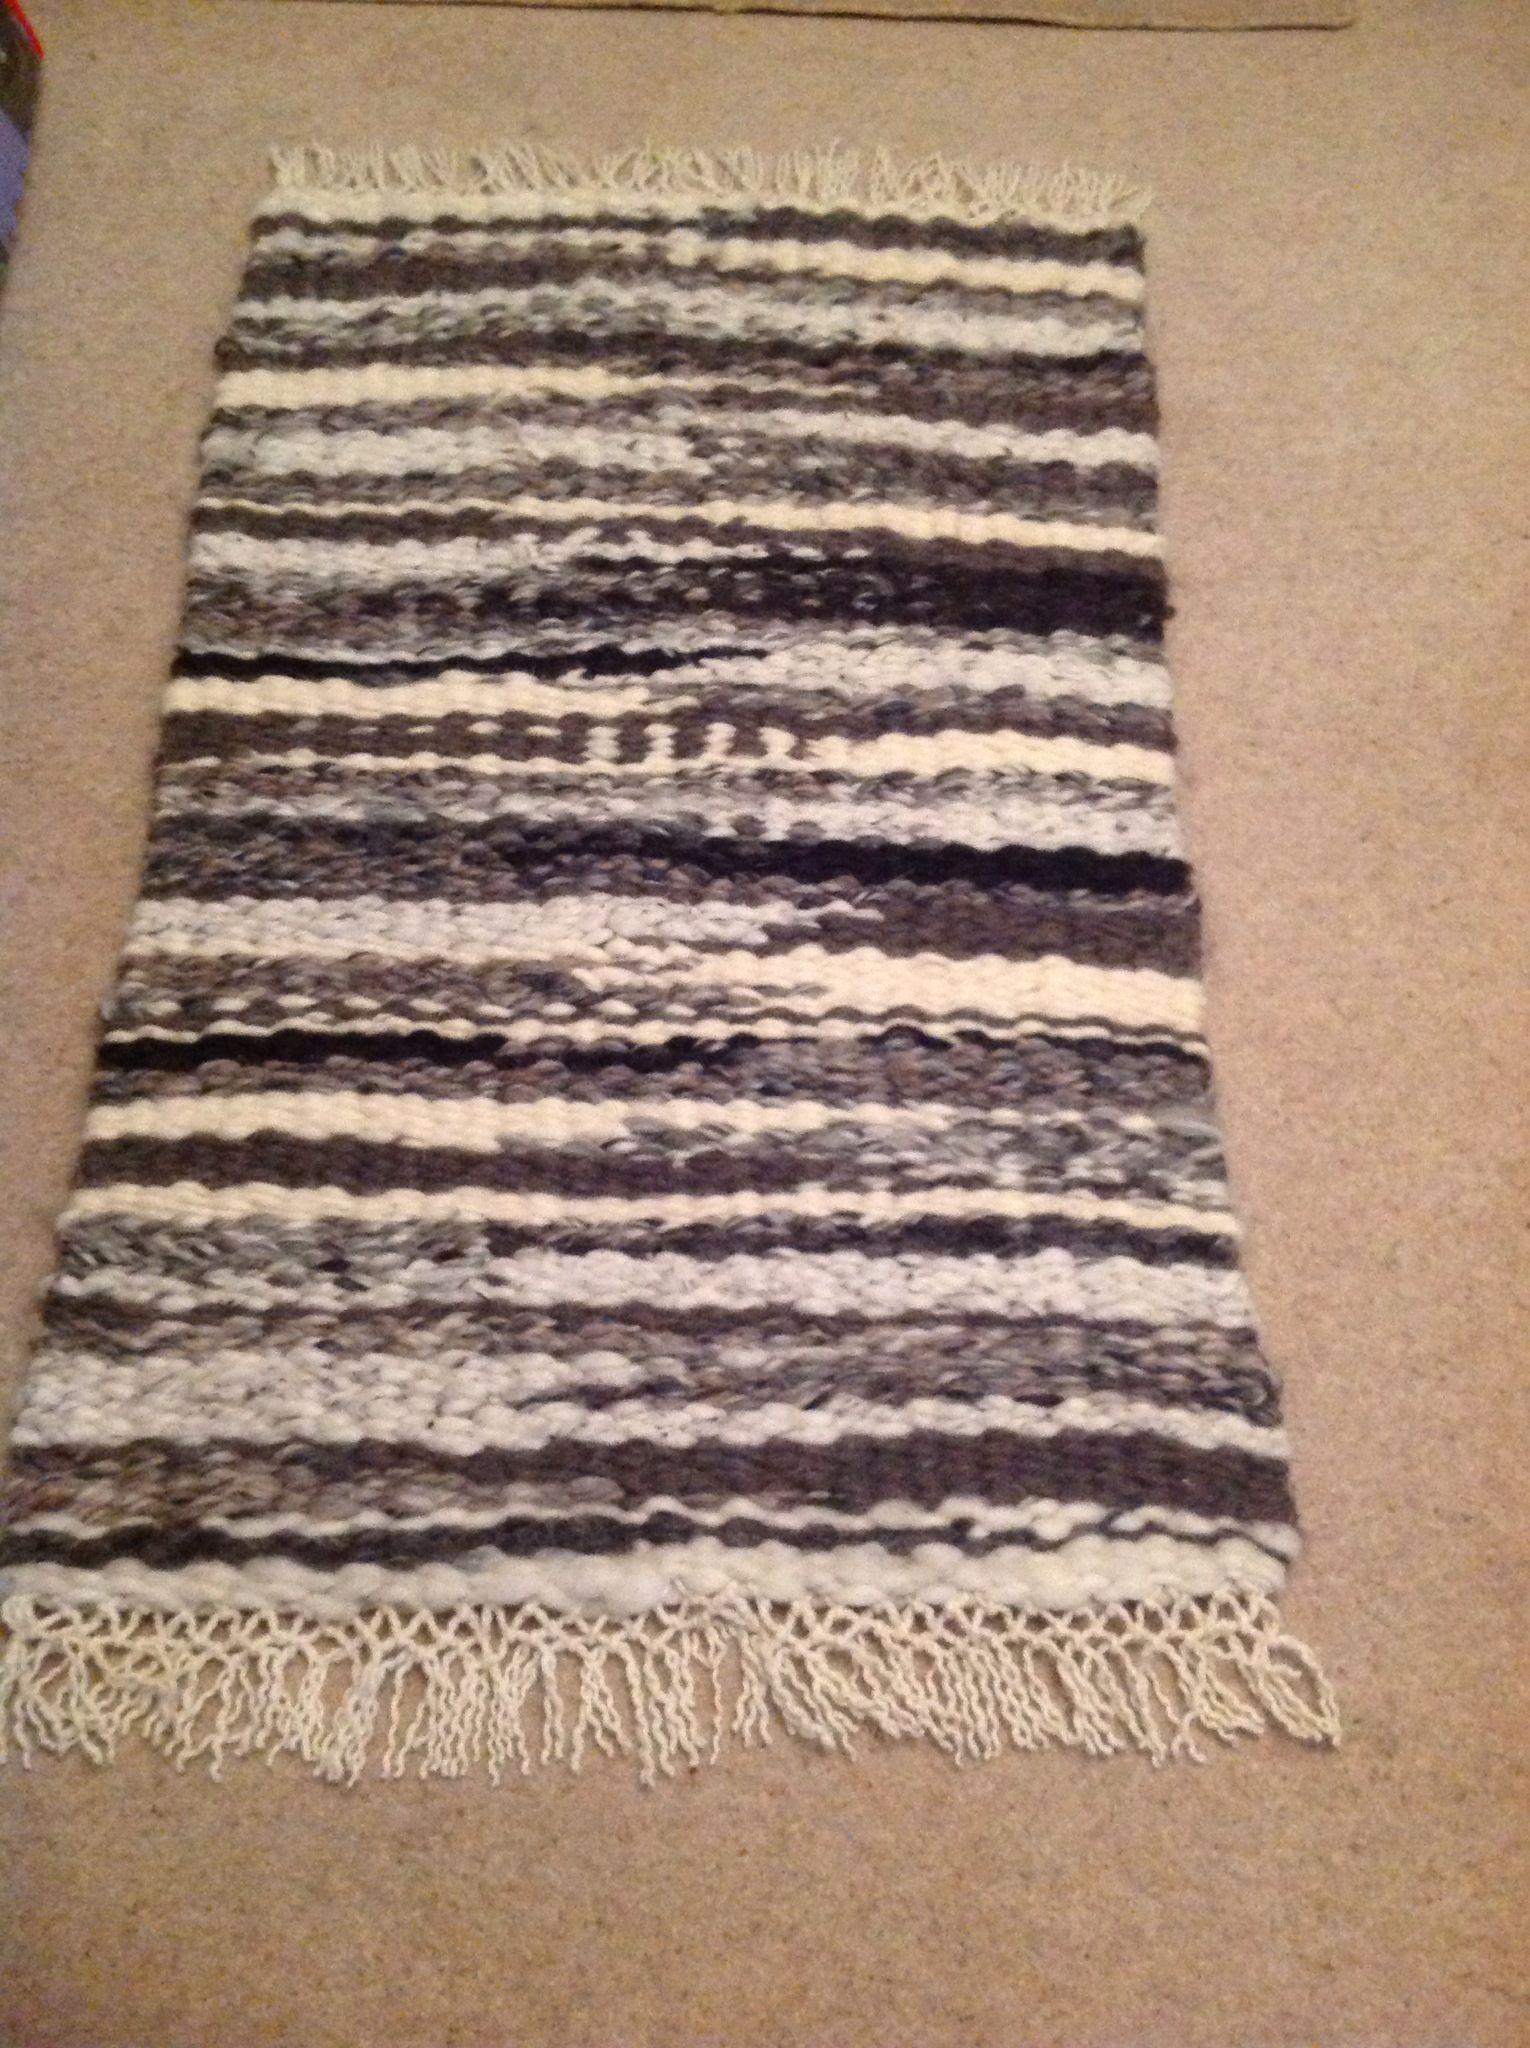 Finished Jacob Sheep Rug Woven On The Peg Loom Weaving